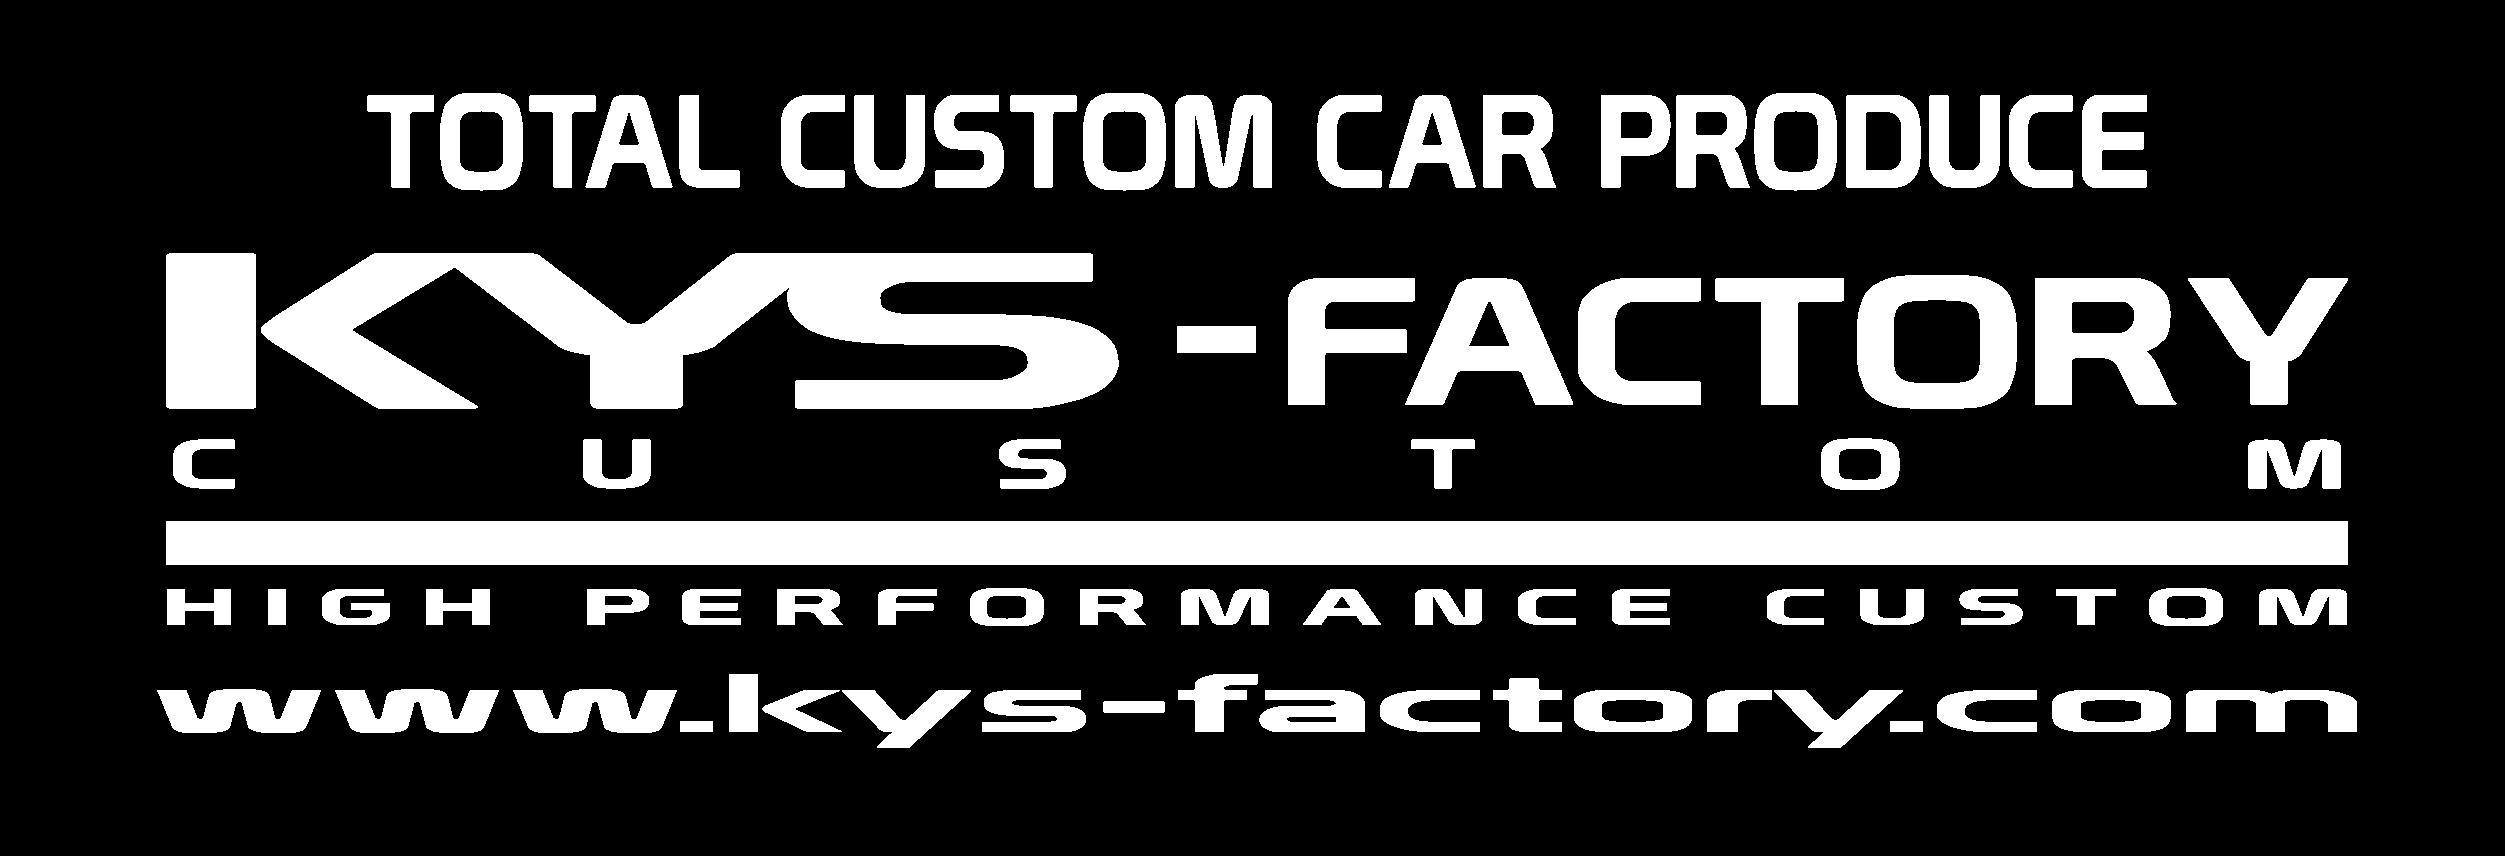 http://www.kys-factory.com/GALLERY/PSR.jpg